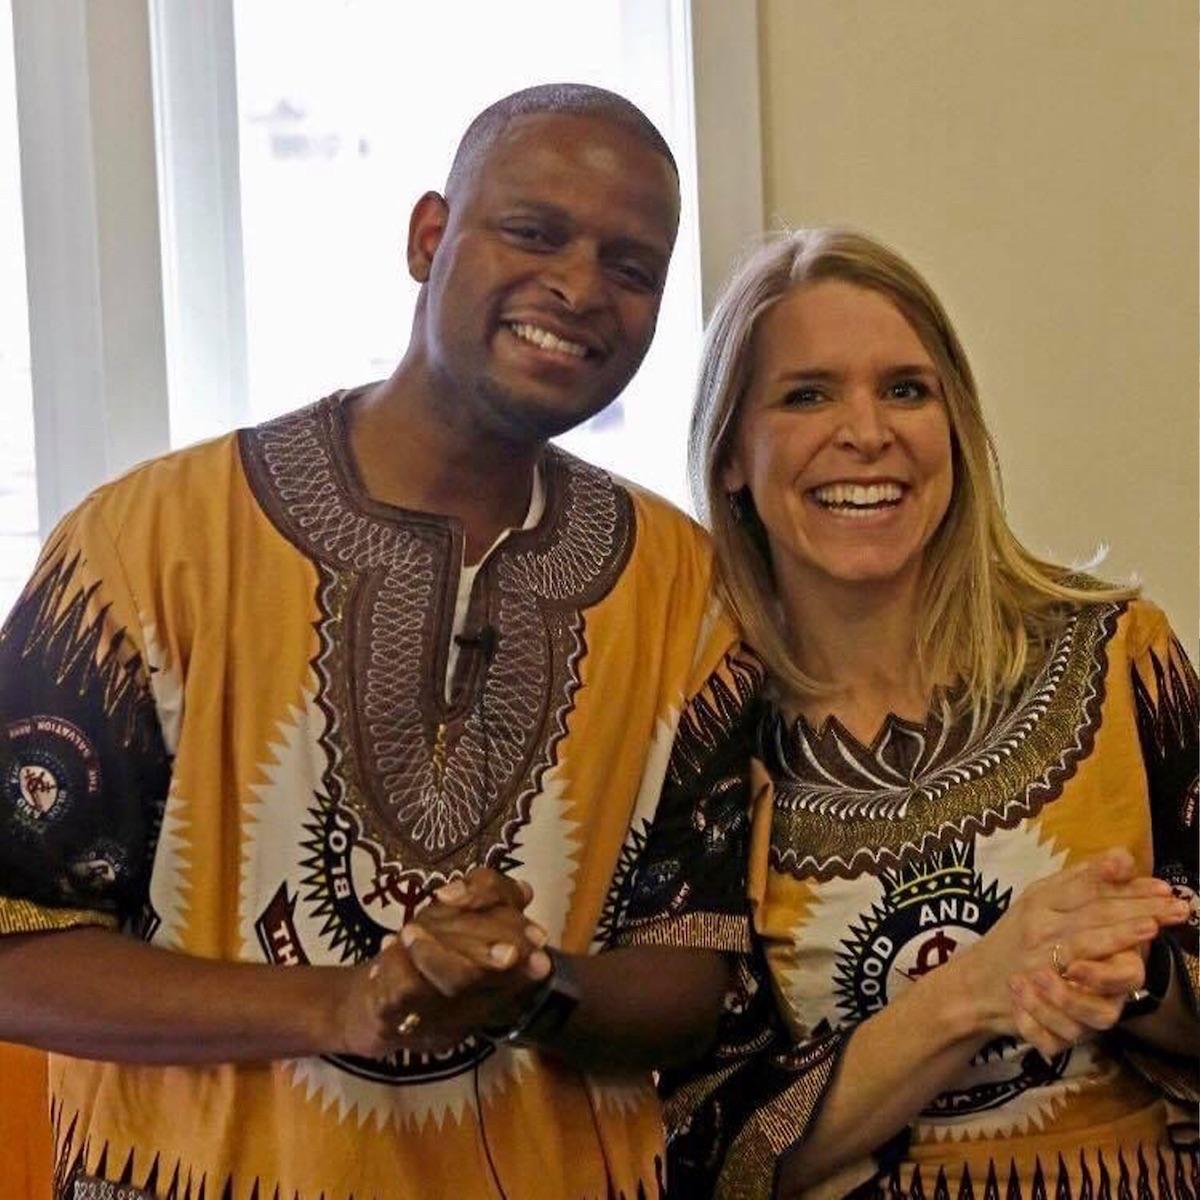 22. Captains Emmanuel and Jennifer Masango